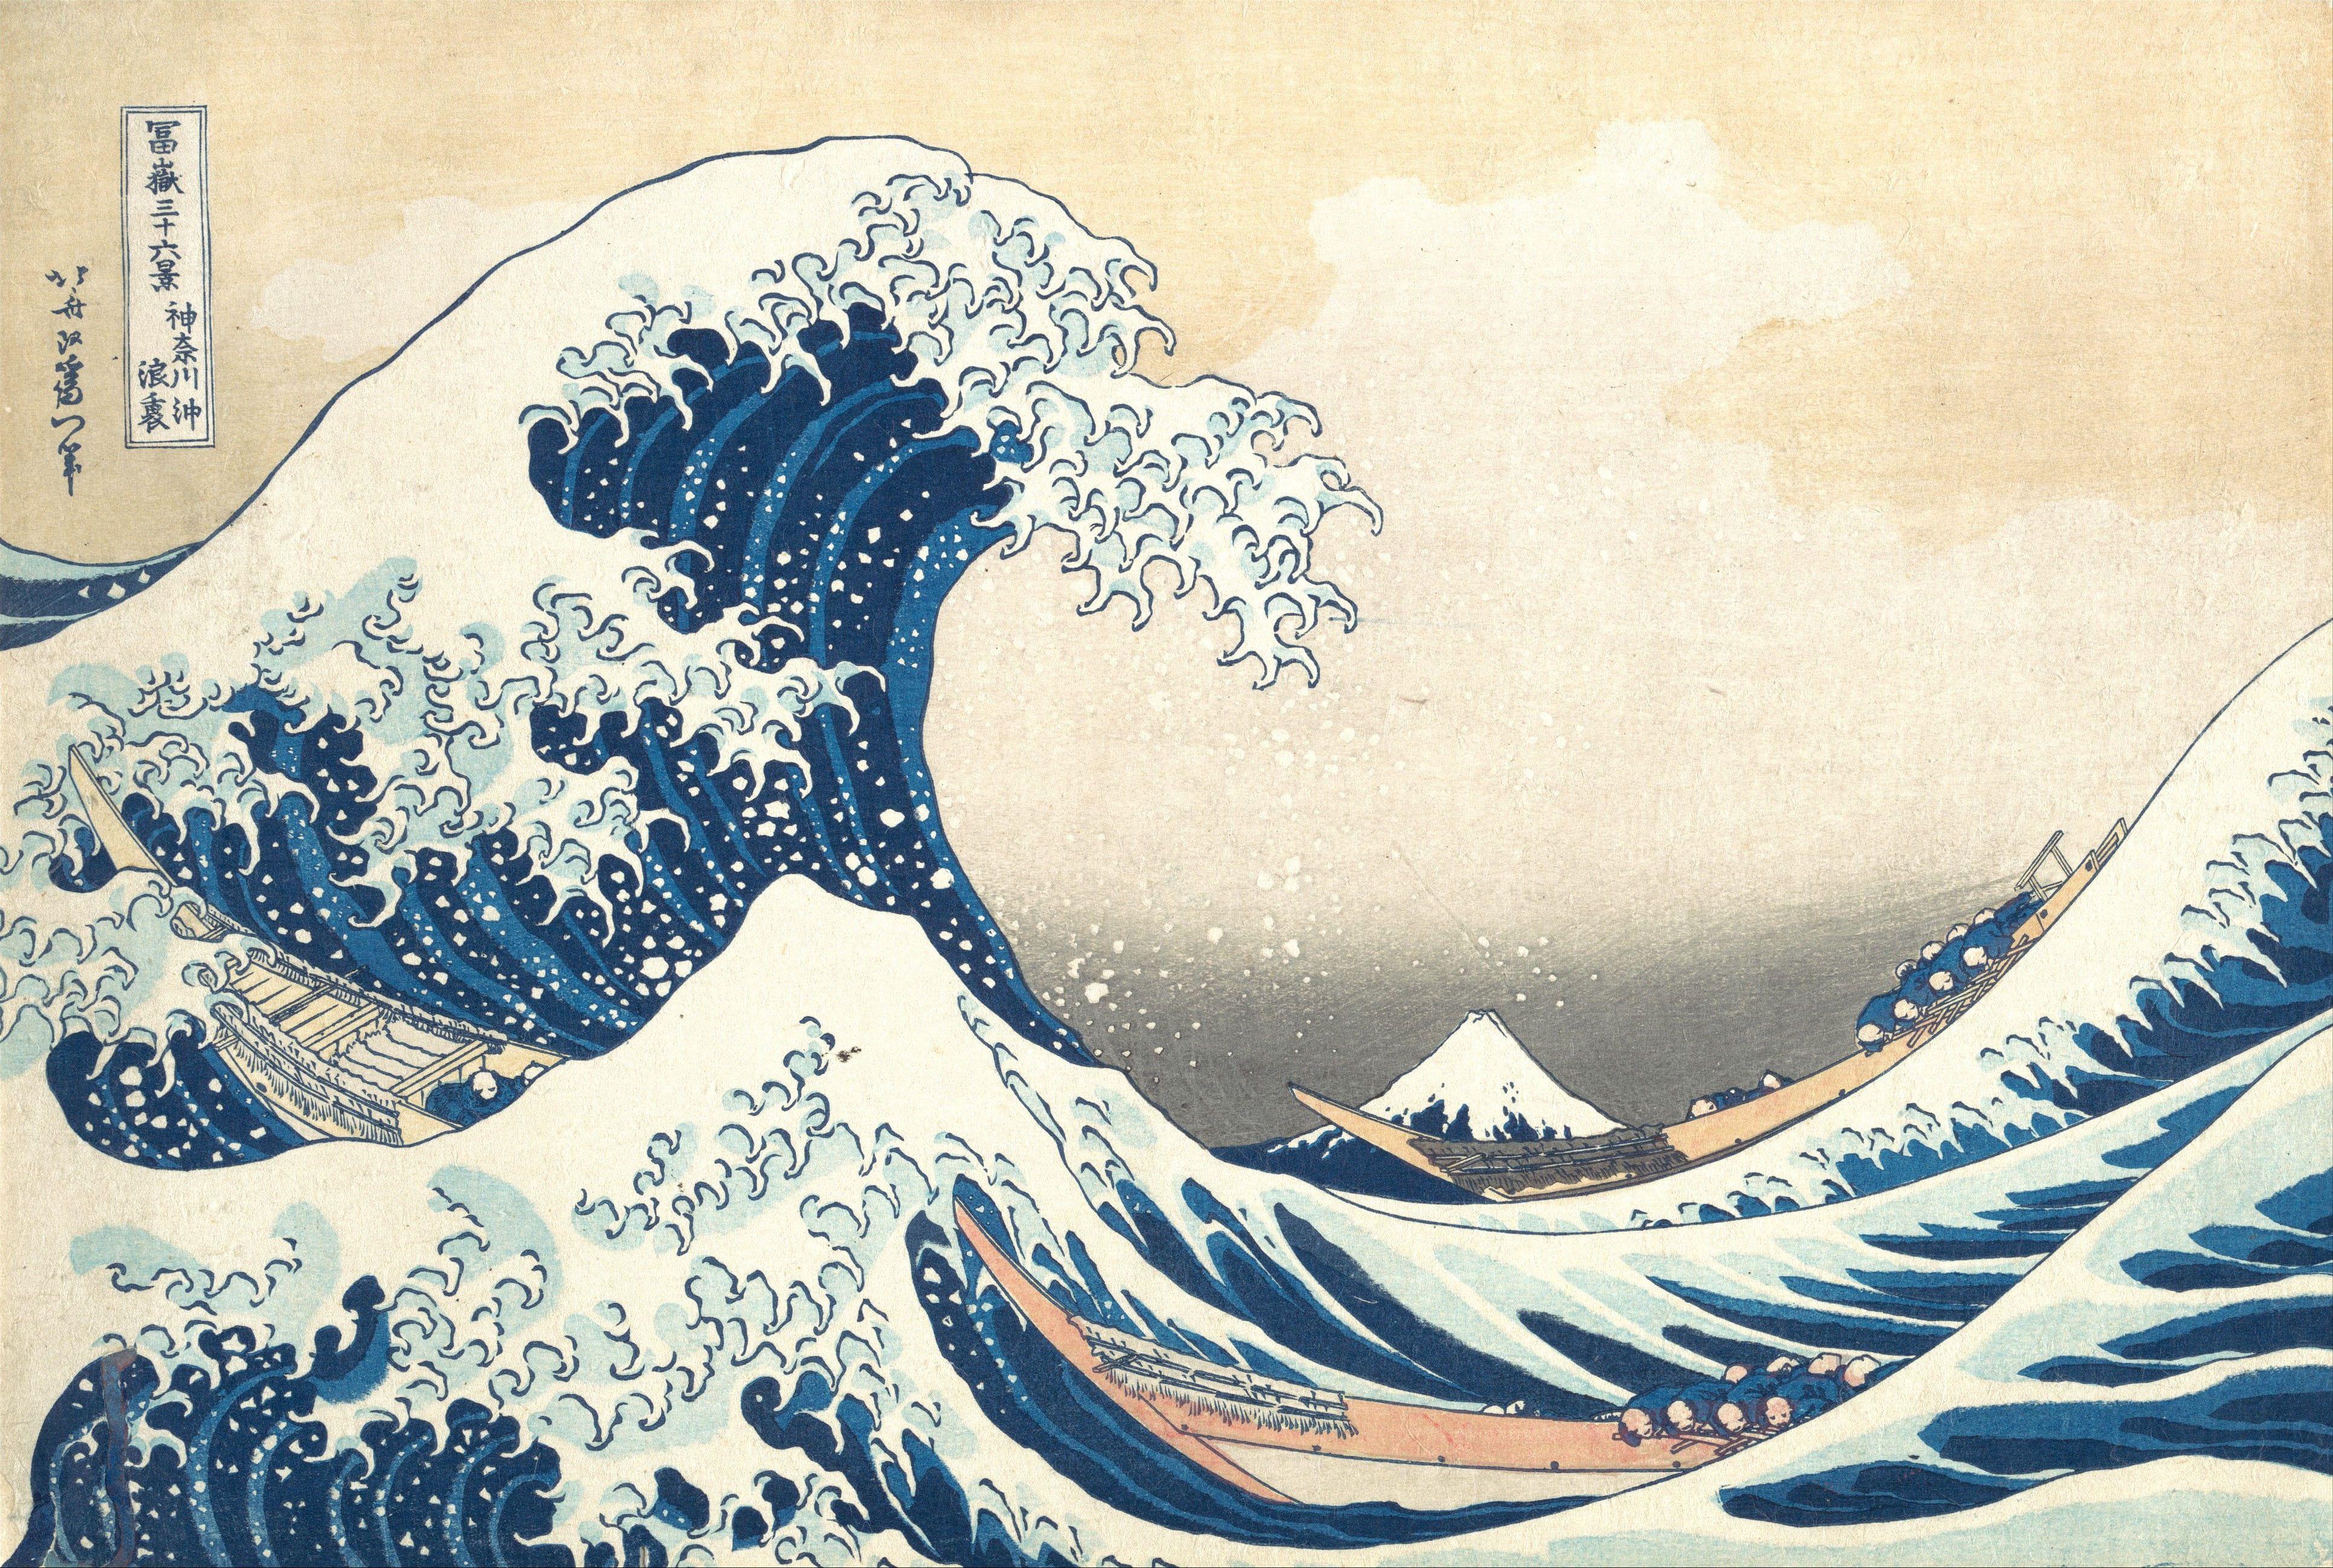 Ocean Wave Illustration Japan Artwork 4k Wallpaper Hdwallpaper Desktop Japanese Woodblock Printing Wave Painting Most Famous Paintings